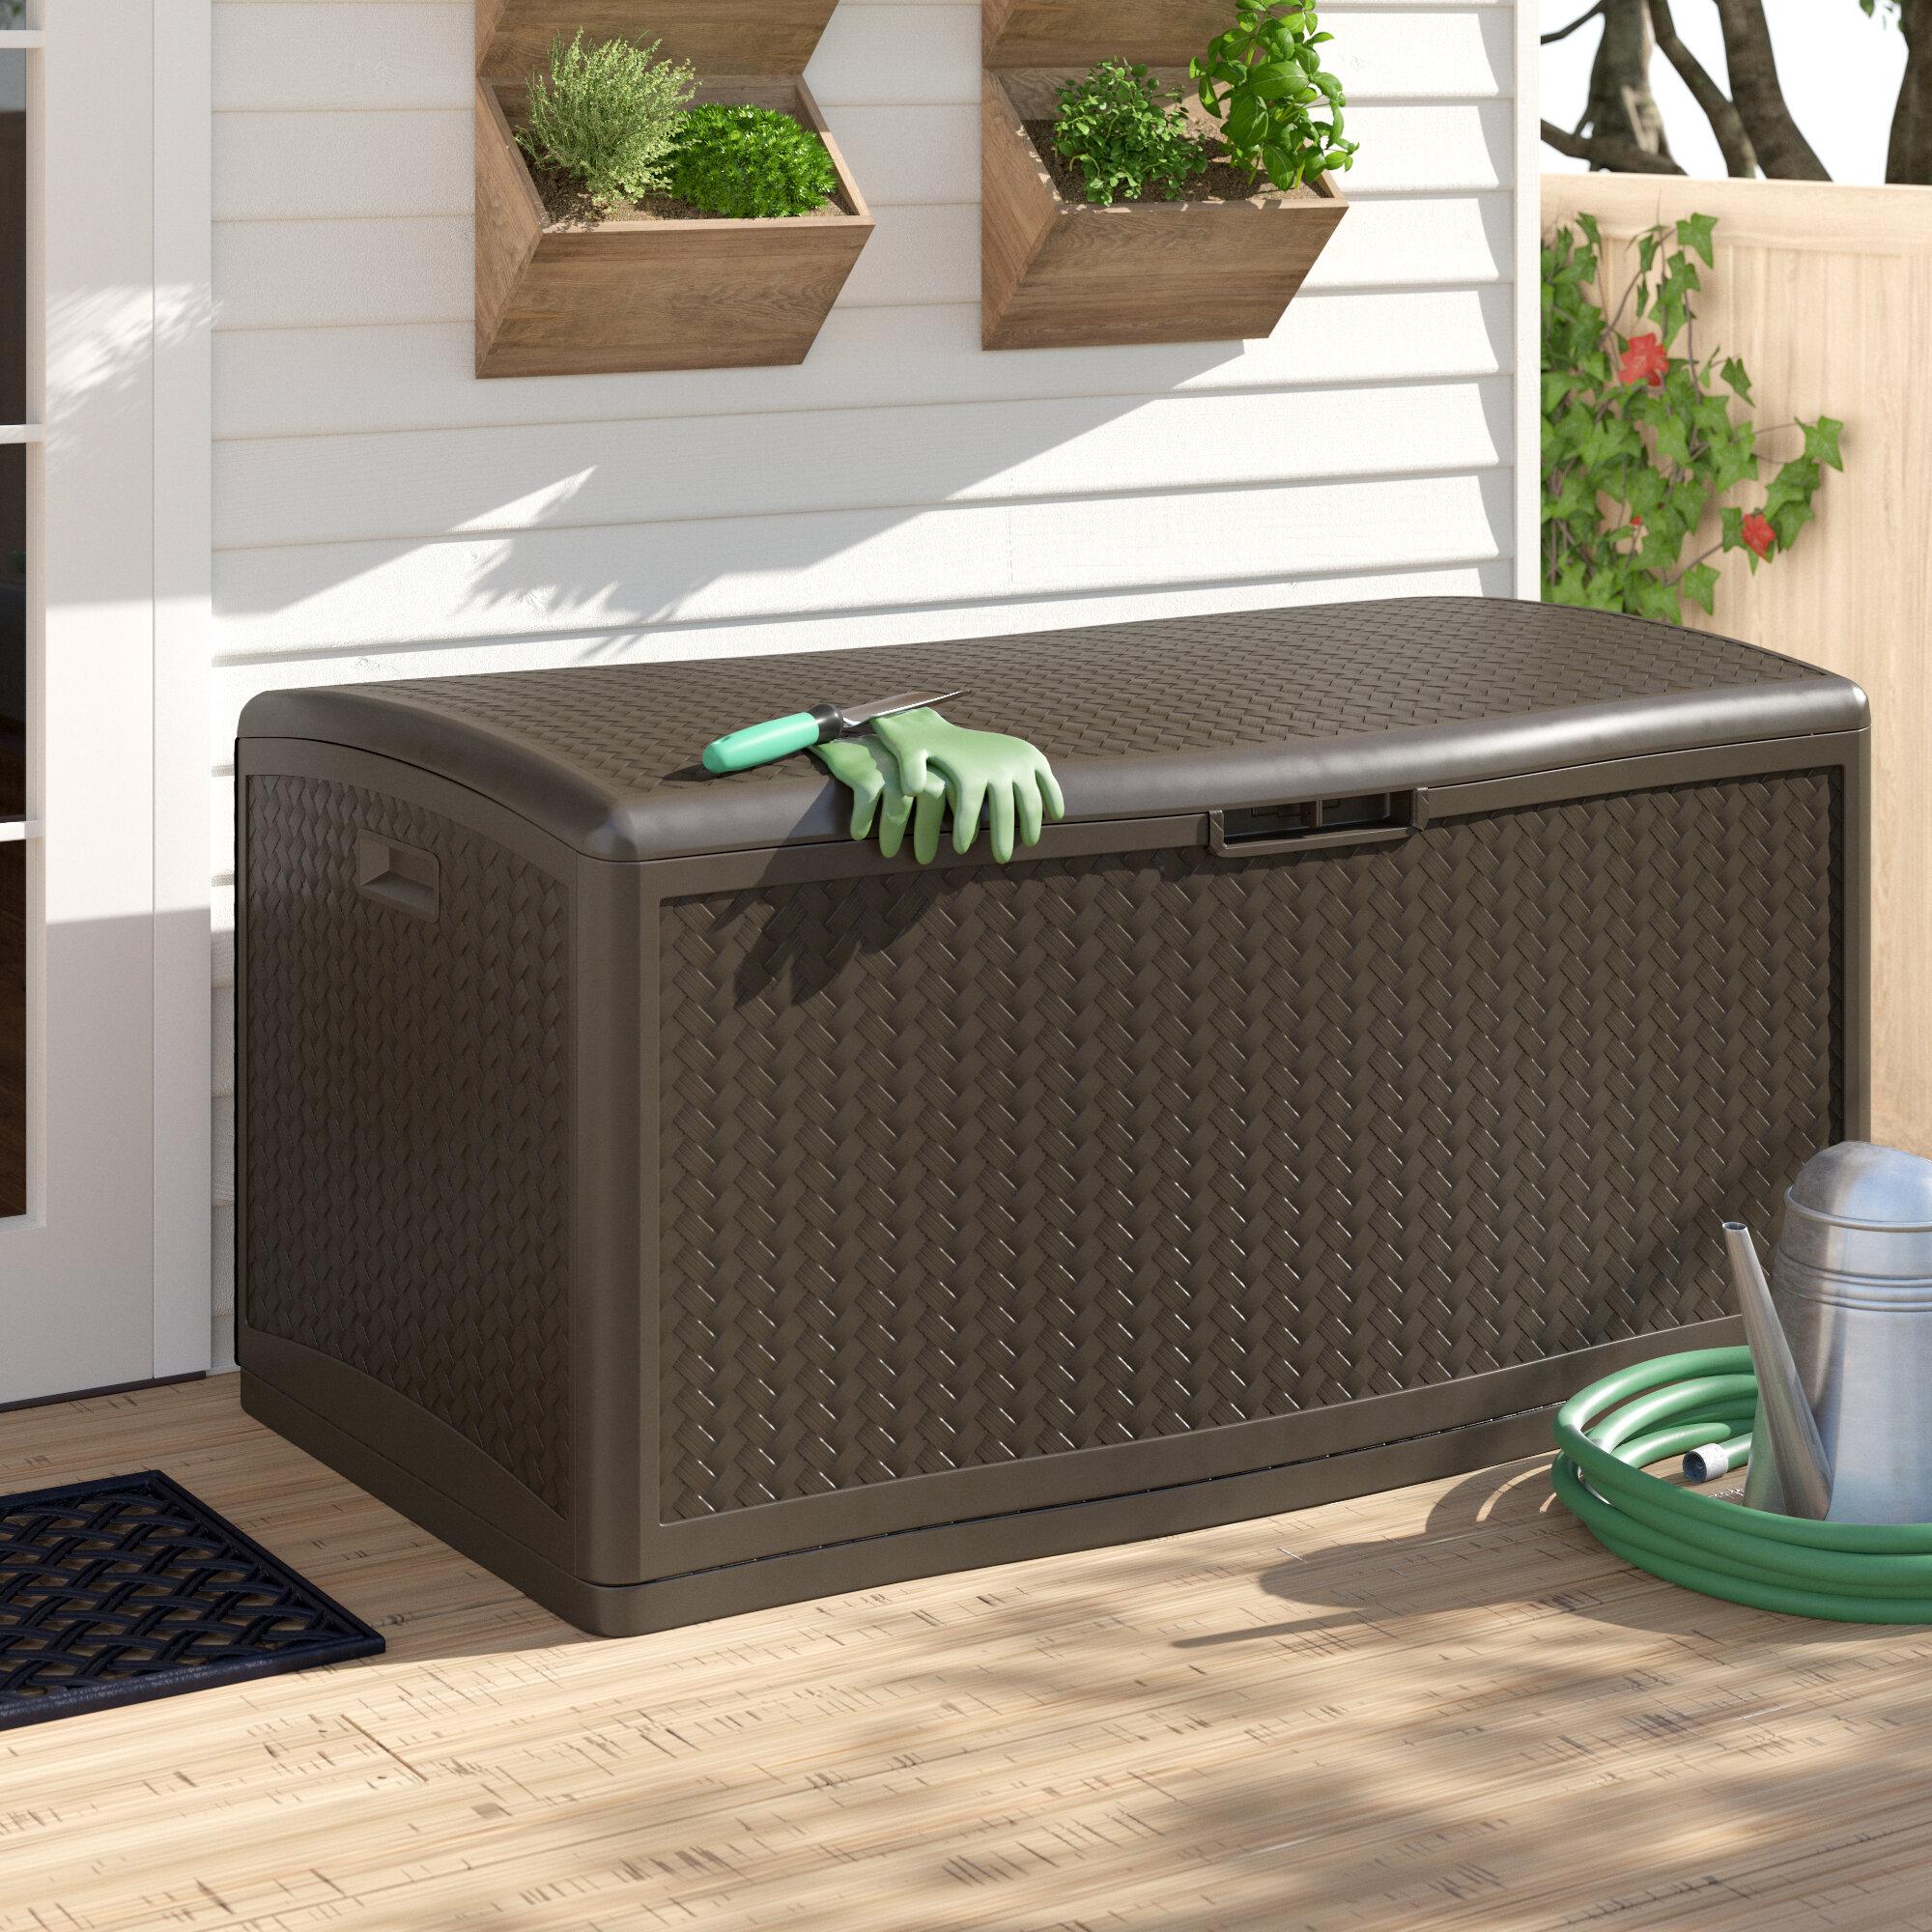 Suncast Java Herringbone Outdoor 124 Gallon Resin Deck Box Reviews Wayfair